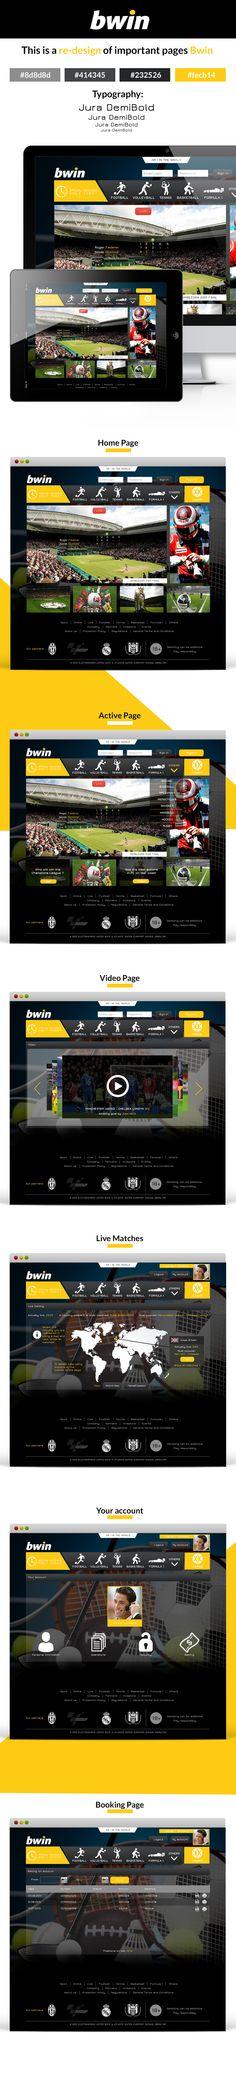 bwin re-design - Web Design on Behance